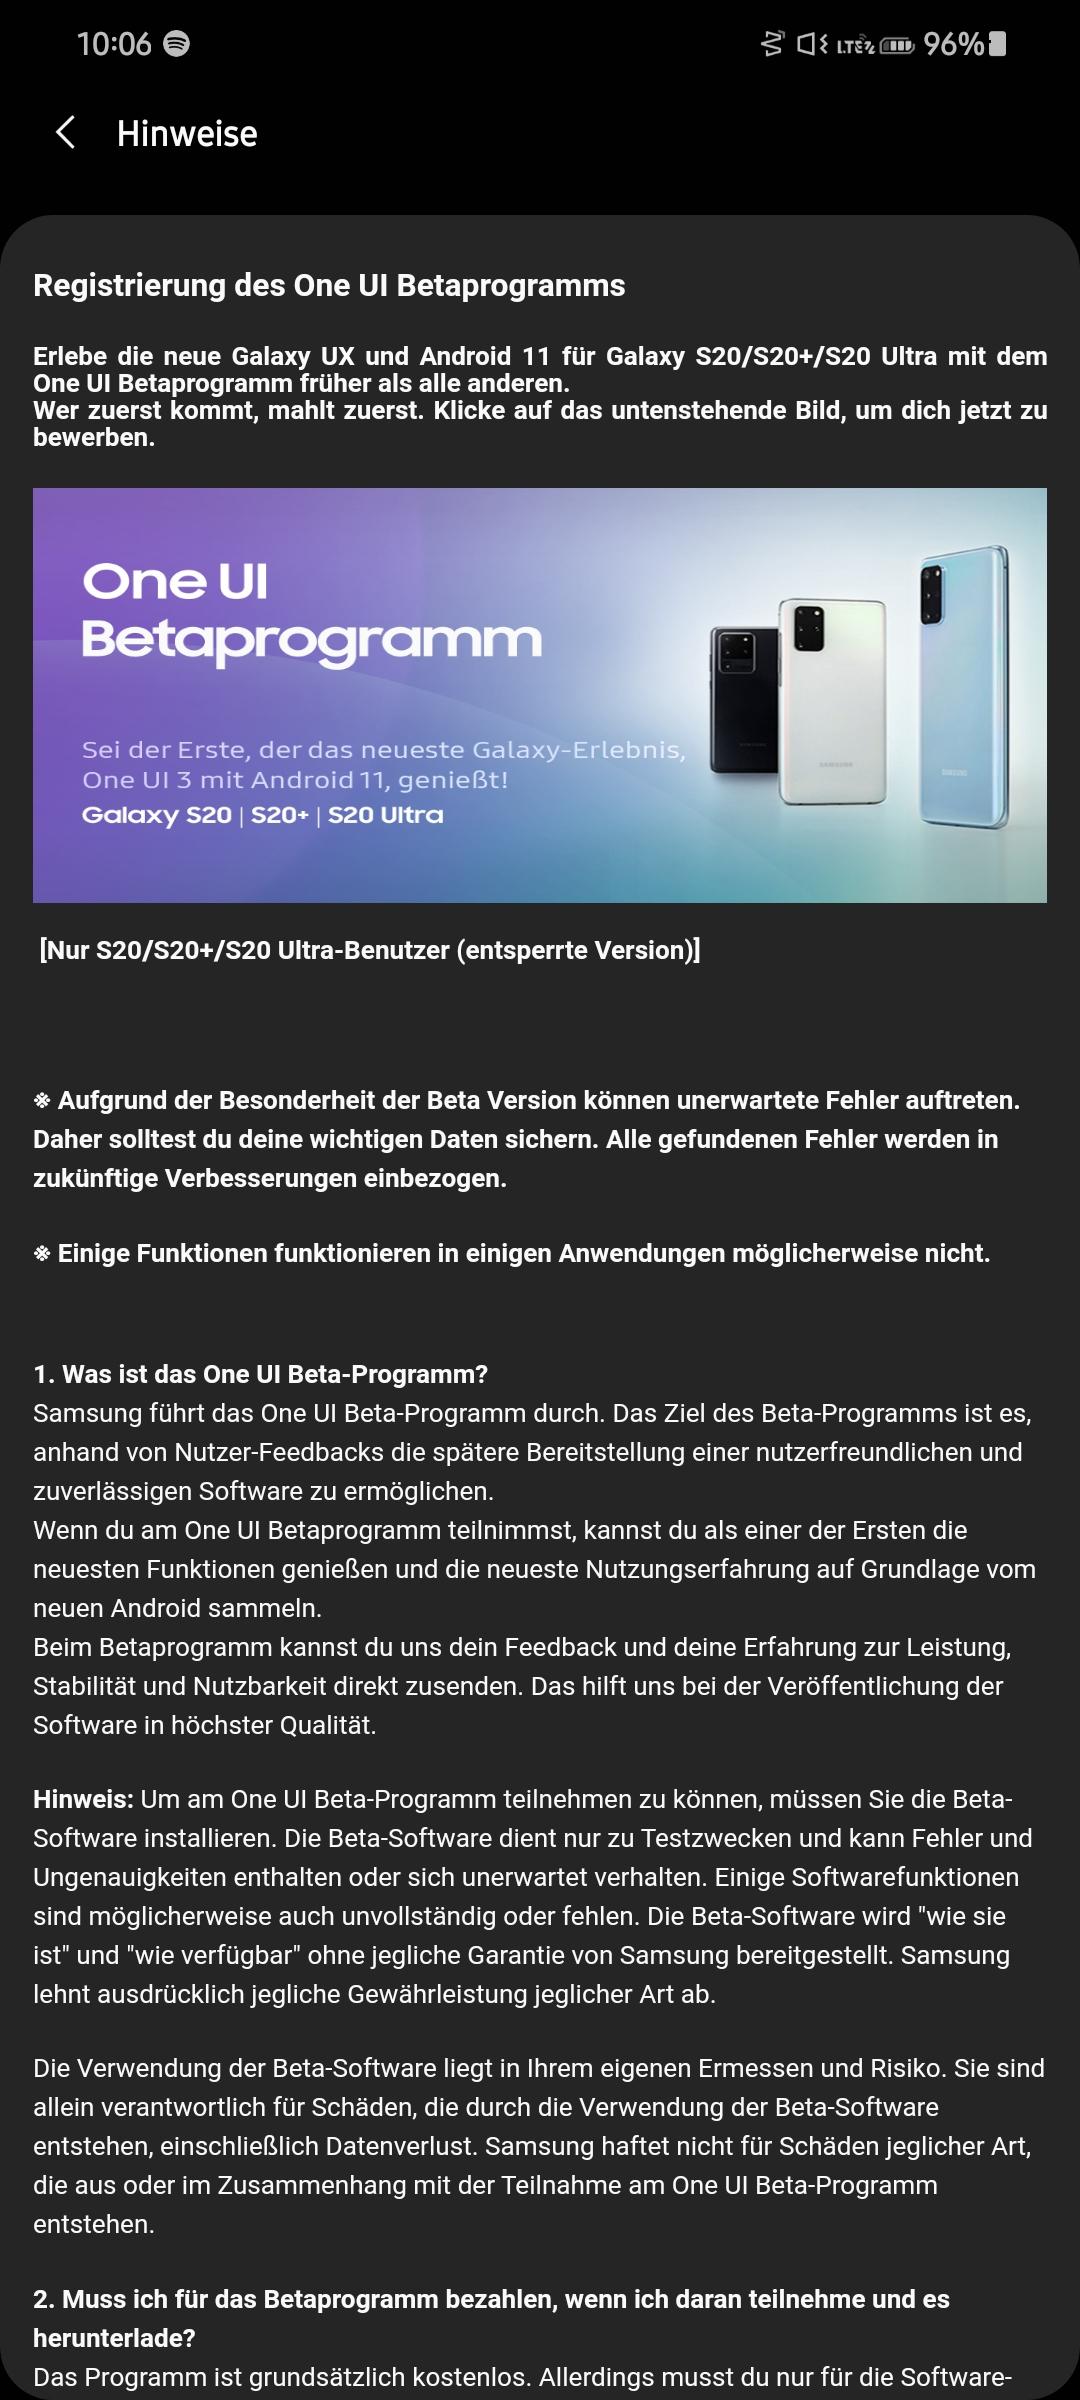 Начато открытое тестирование One UI 3 на Samsung Galaxy S20 Samsung  - samsung_nachala_otkrytoe_testirovanie_one_ui_3_na_galaxy_s20_s_exynos_1